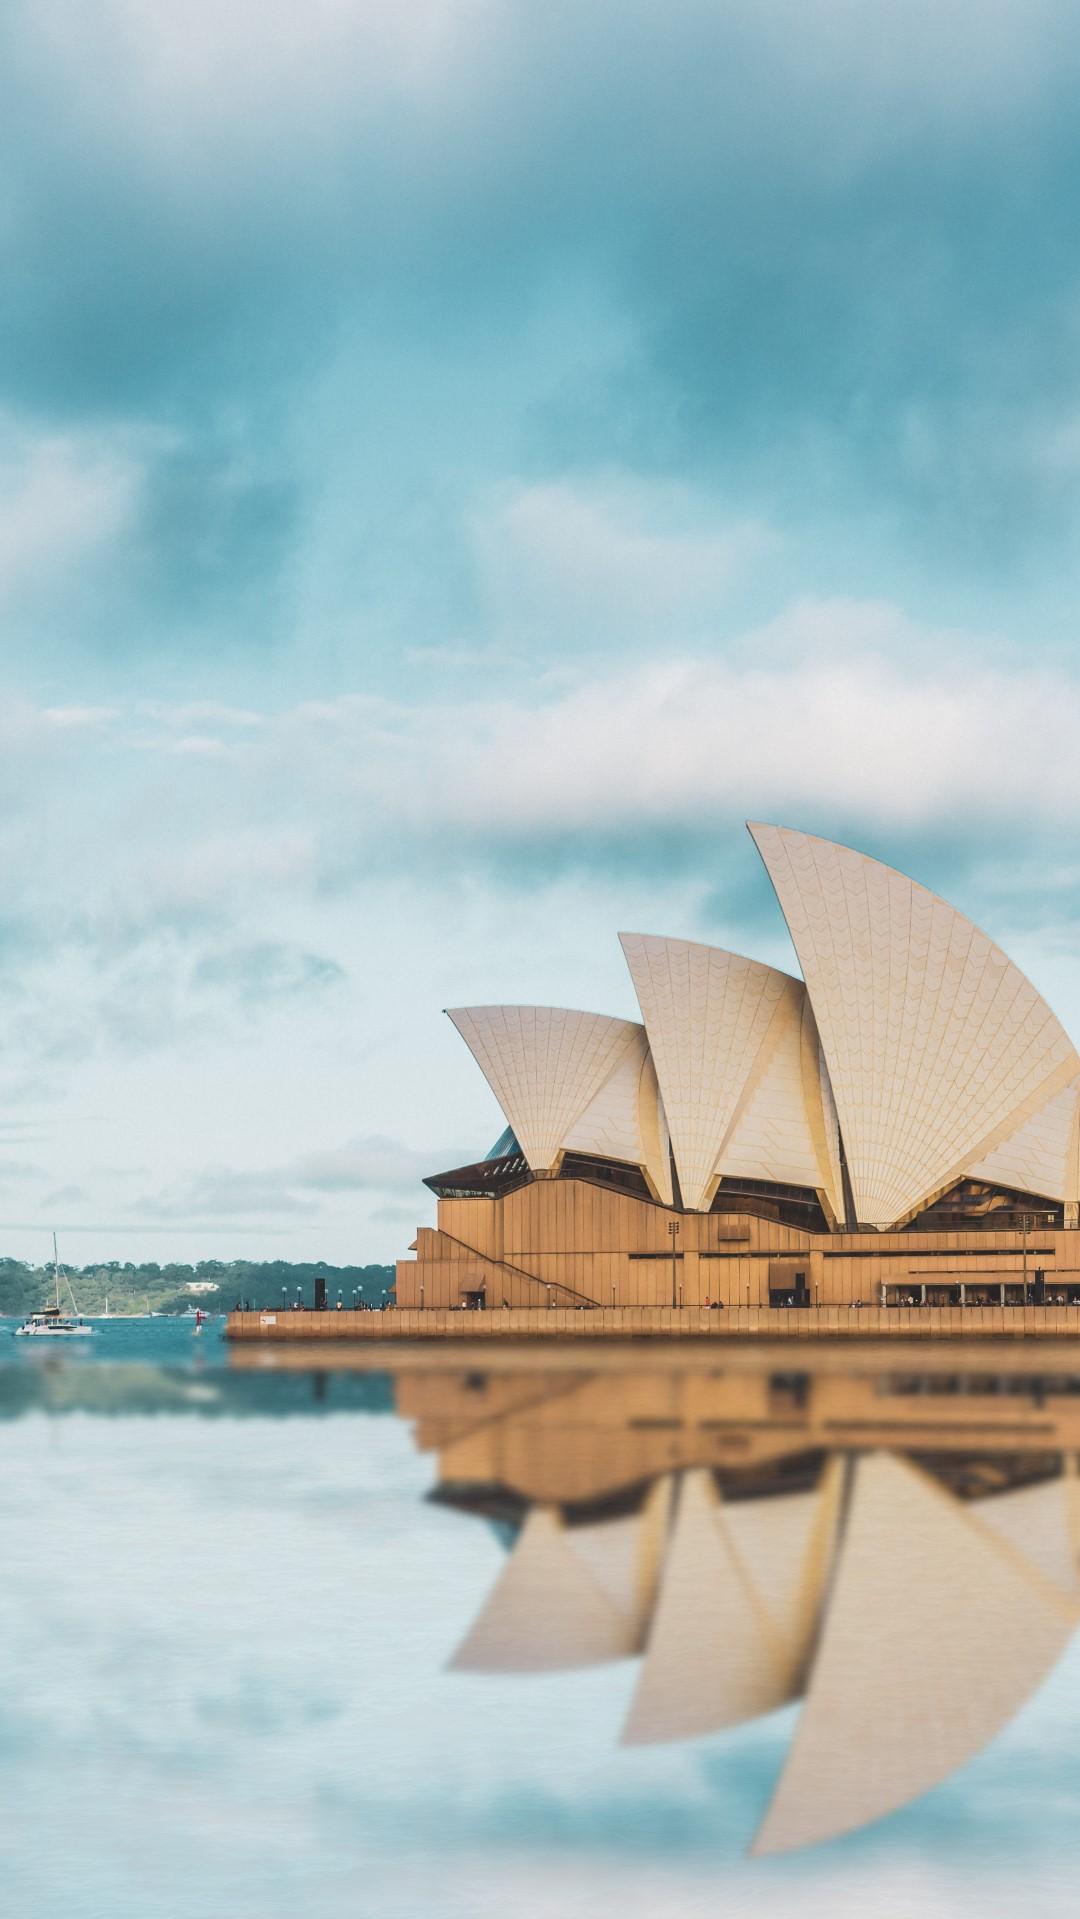 Enjoy a Luxurious Vacation in Australia